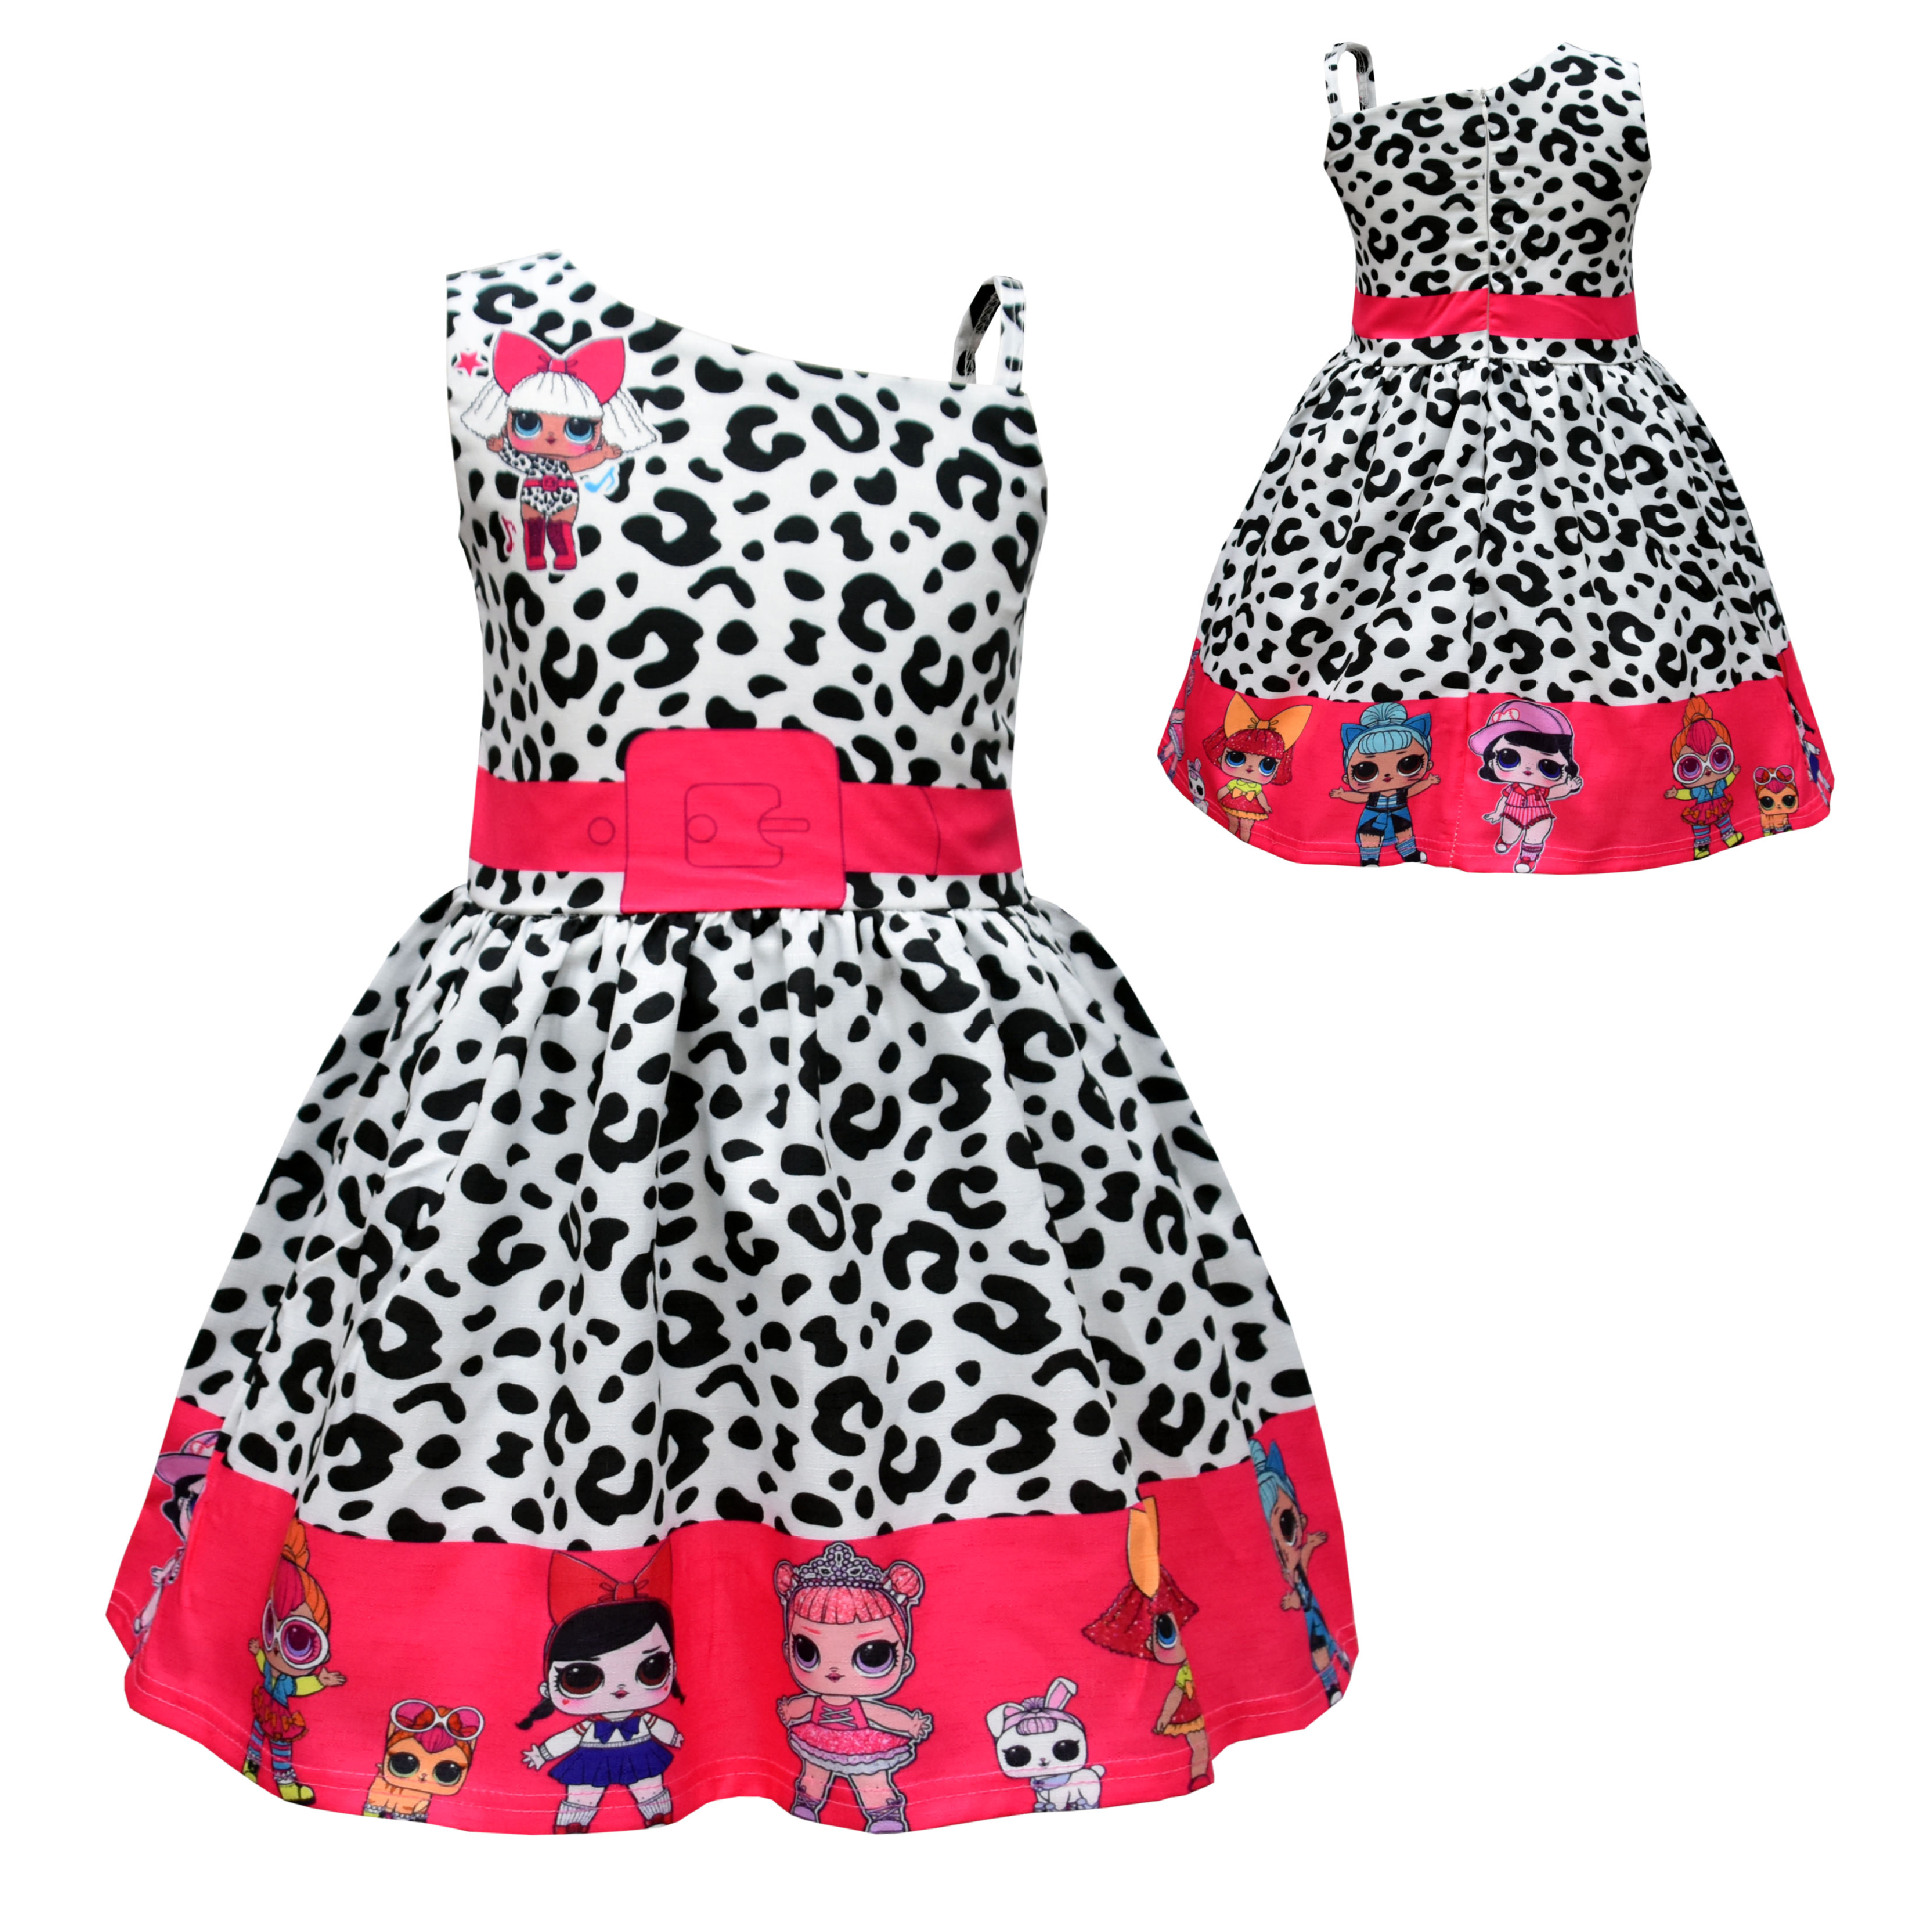 New Summer Surprise Girl Princess Dress Cute Cartoon Unicorn Party Dress Children Clothing 3